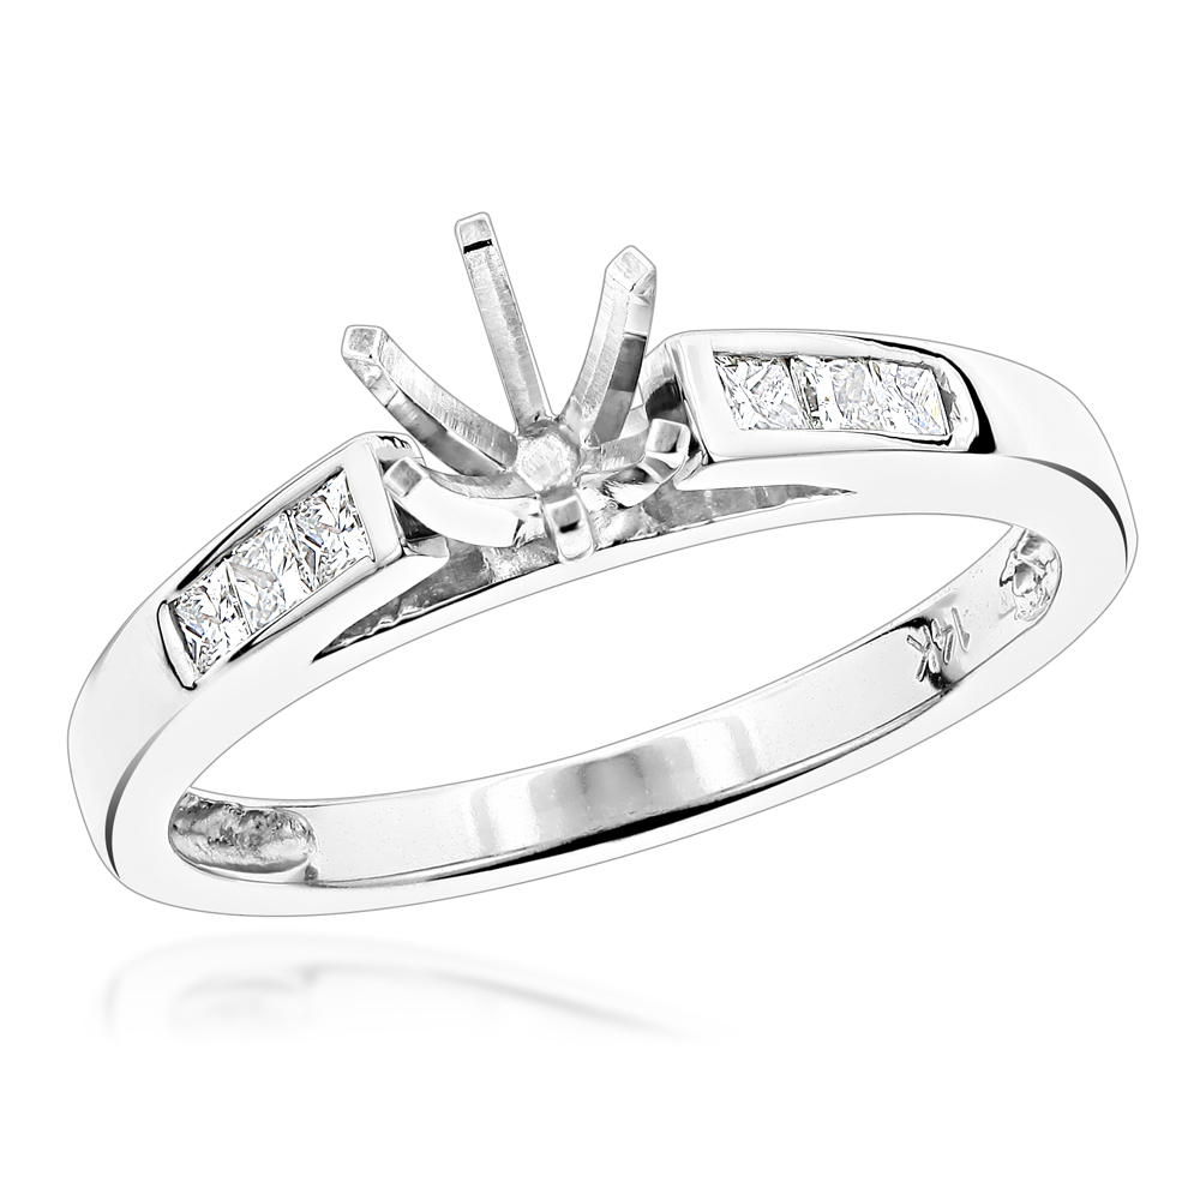 14K Gold Princess Cut Diamond Engagement Ring Mounting 14 Carat Six